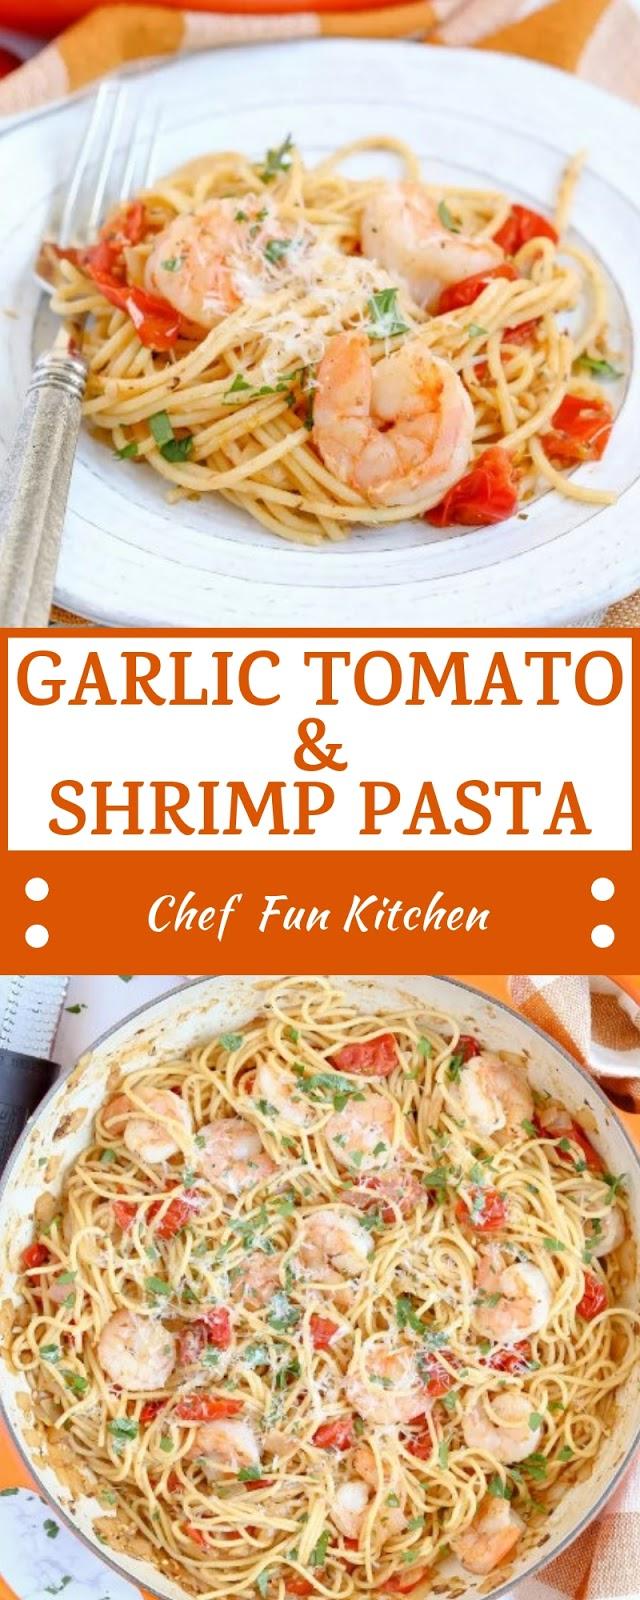 GARLIC TOMATO & SHRIMP PASTA